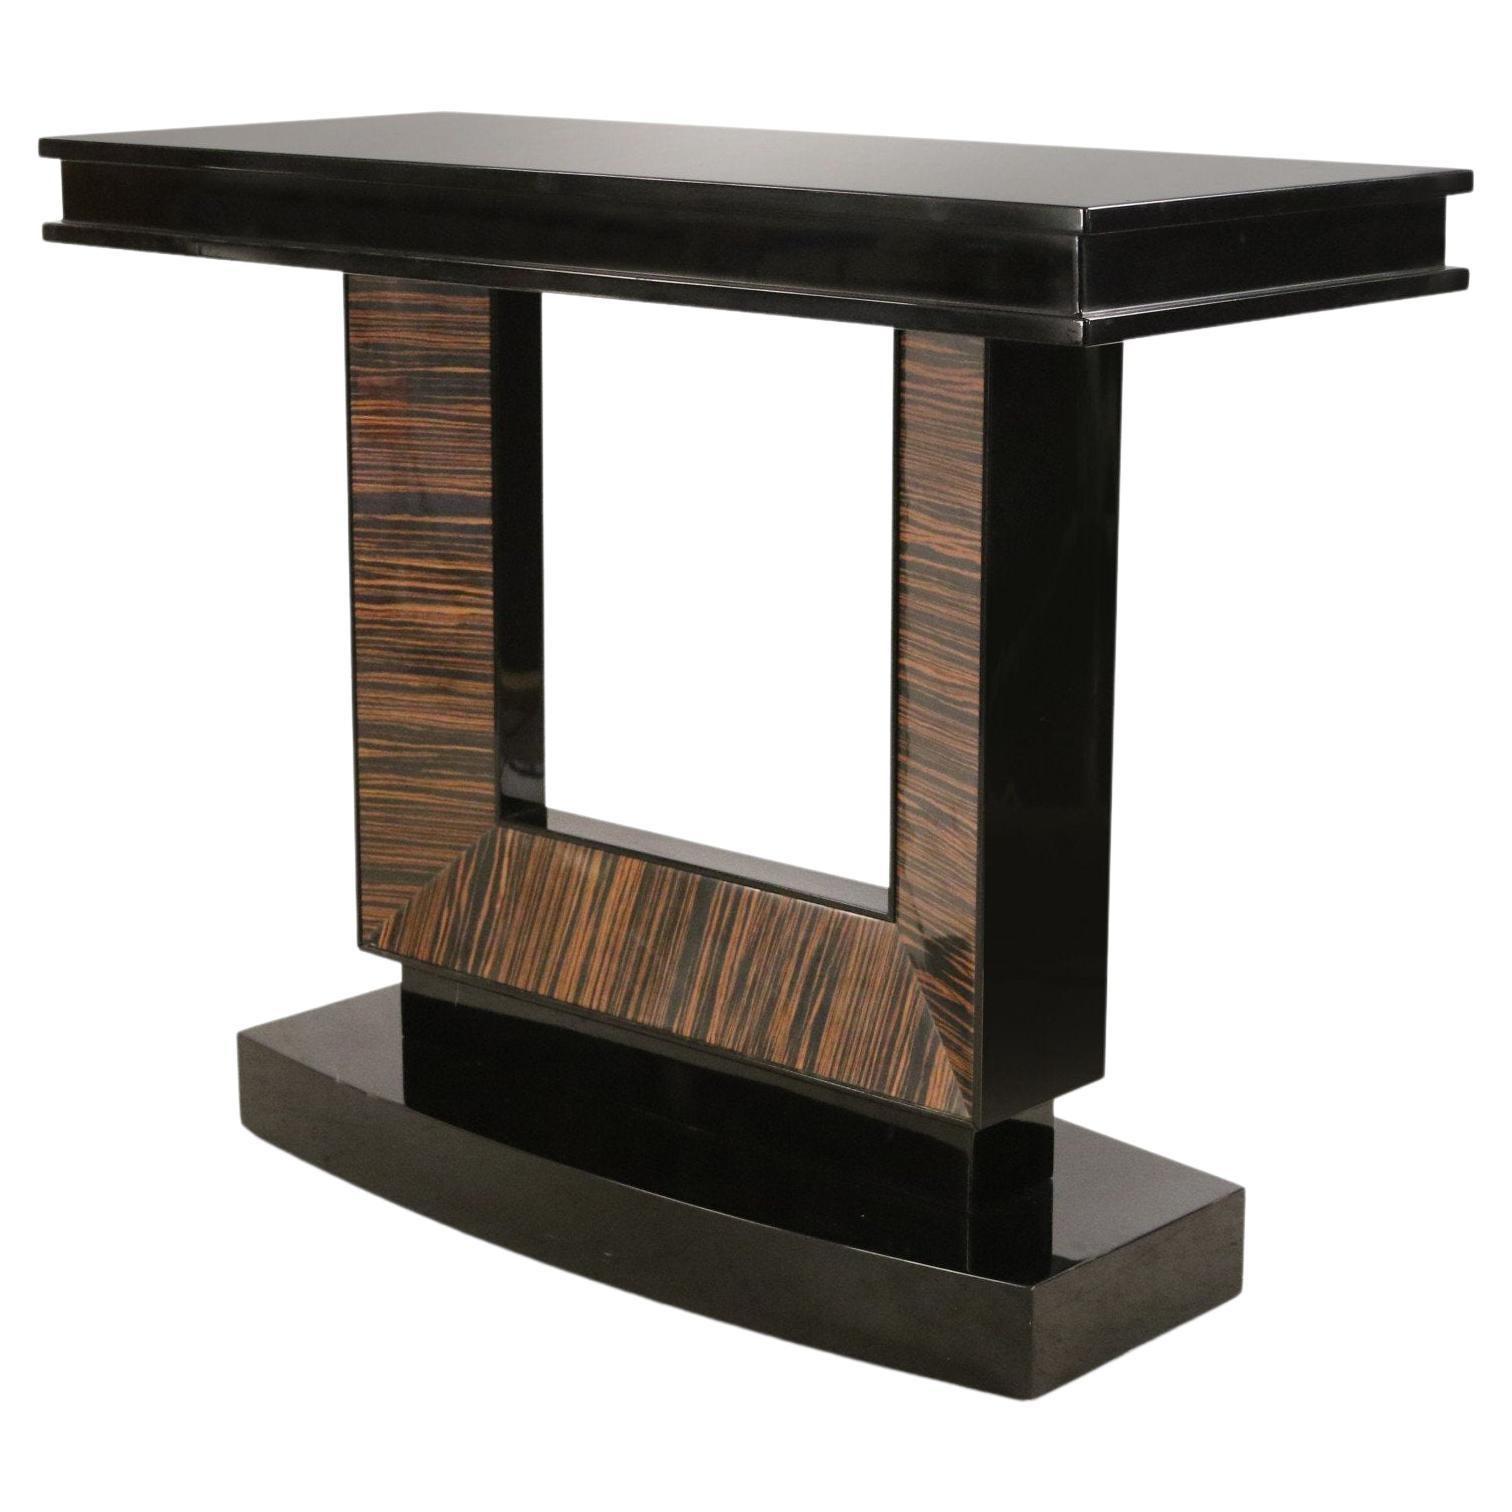 Contemporary Art Deco Style Palisander Veneer Console Table